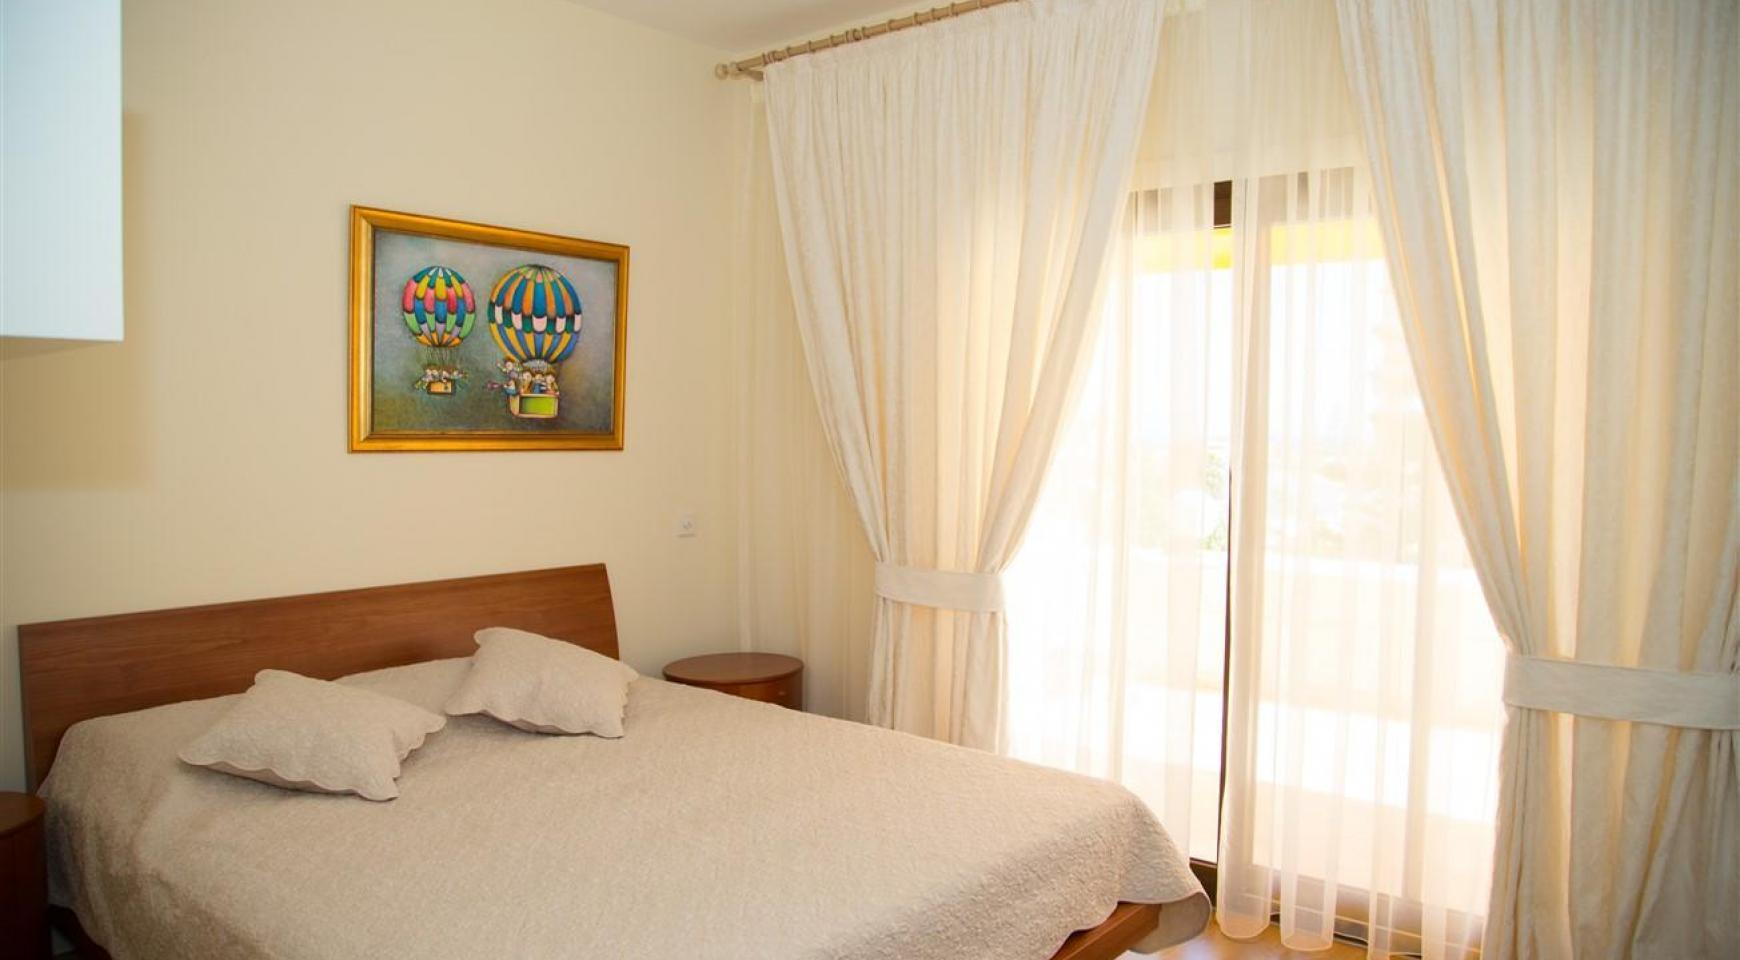 3-Спальная Квартира на Берегу Моря в Комплексе Thera   - 9